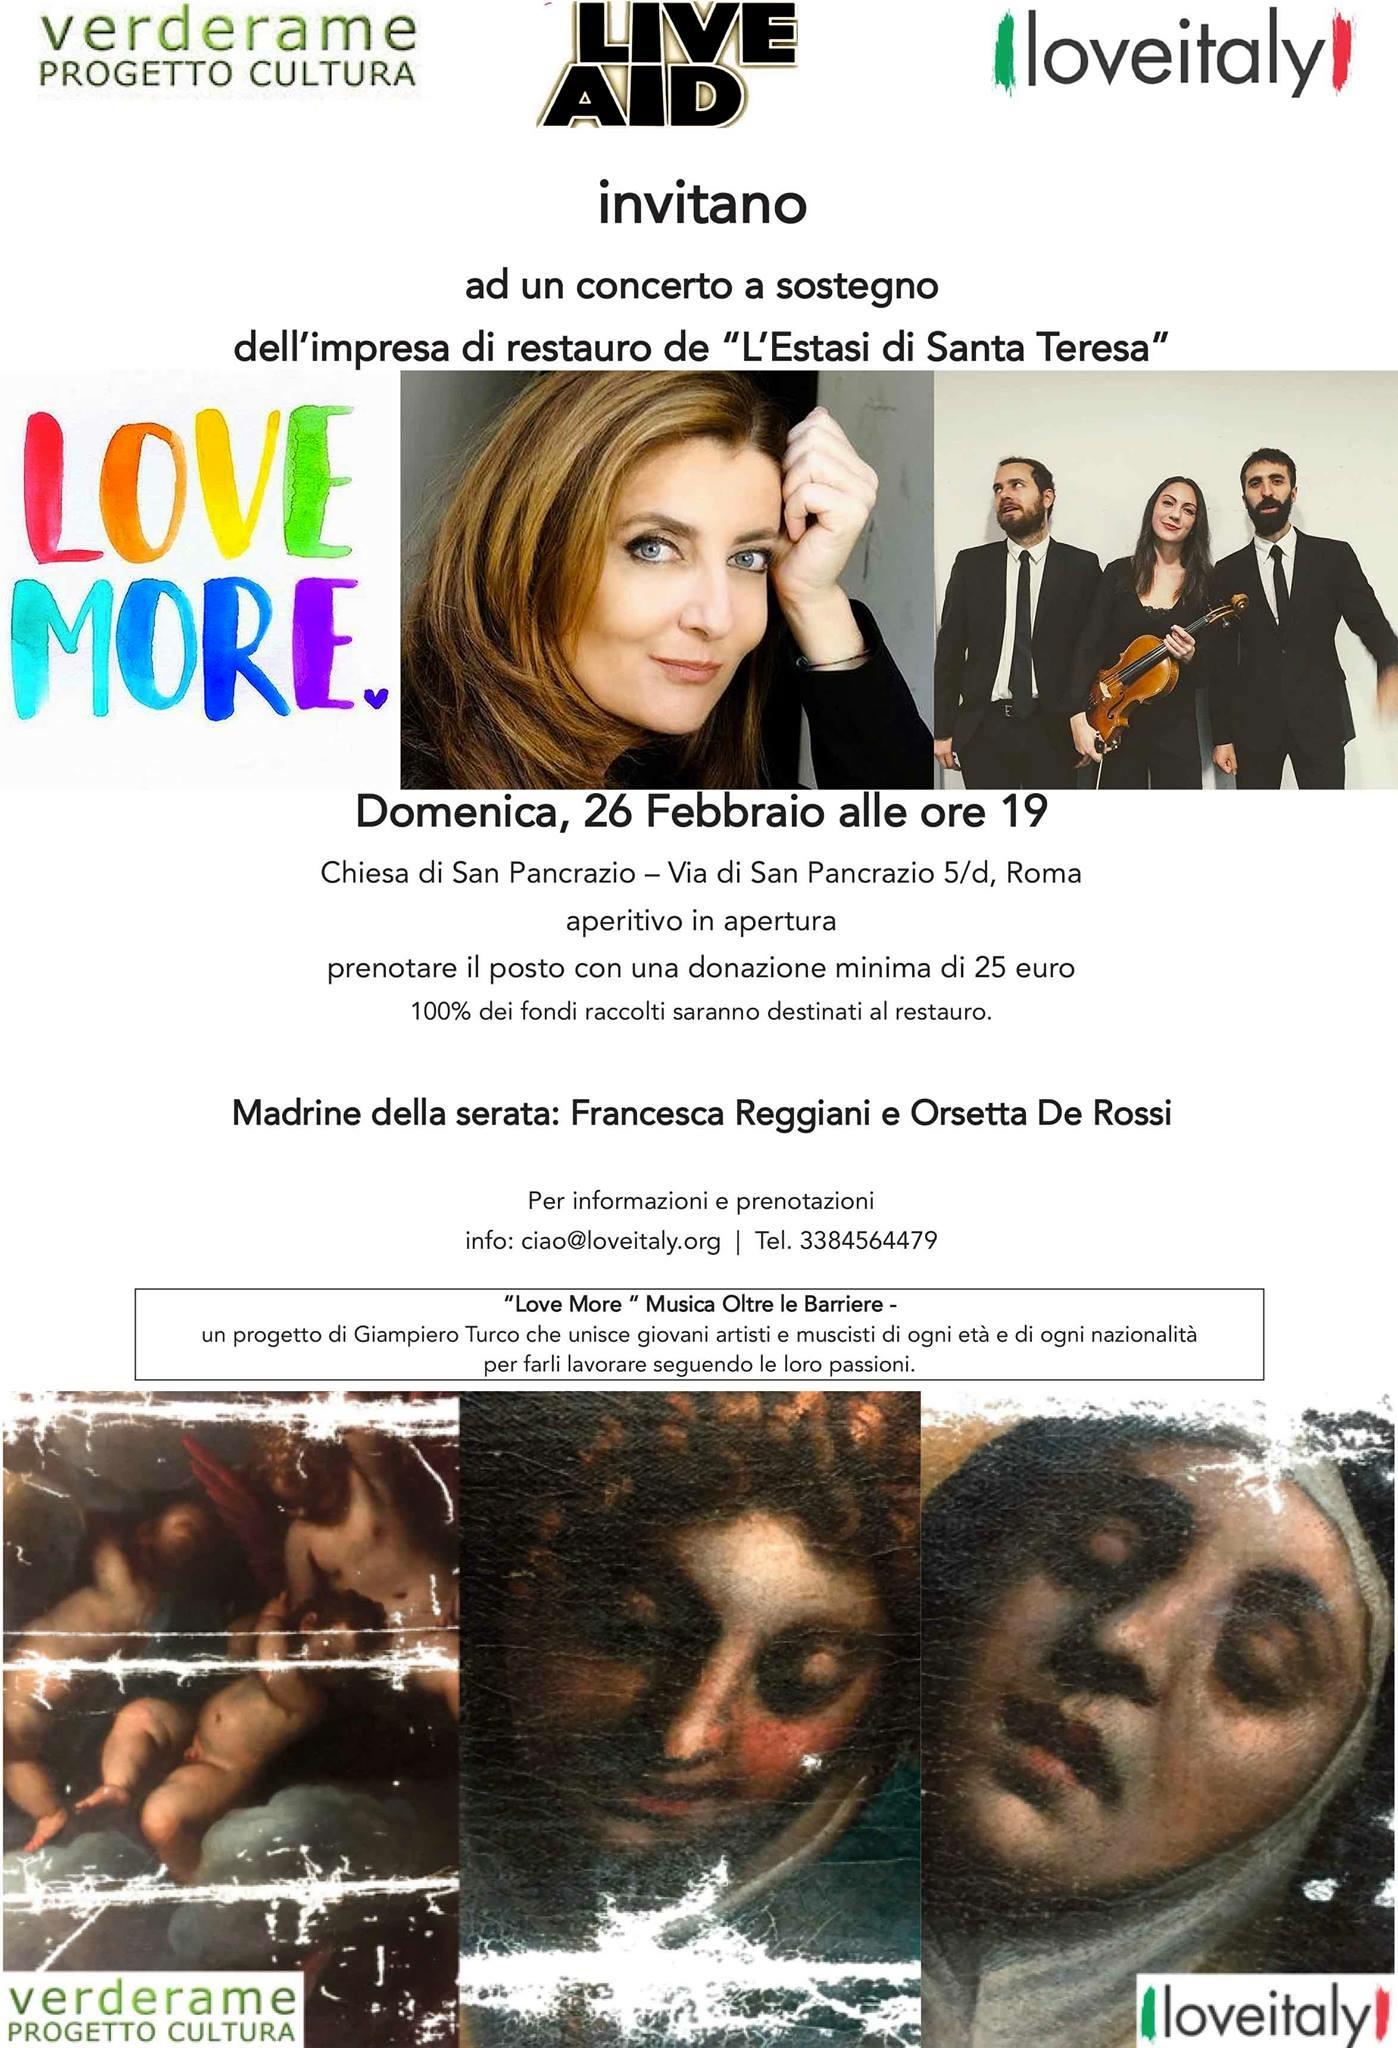 A concert for Saint Teresa: evening event at San Pancrazio